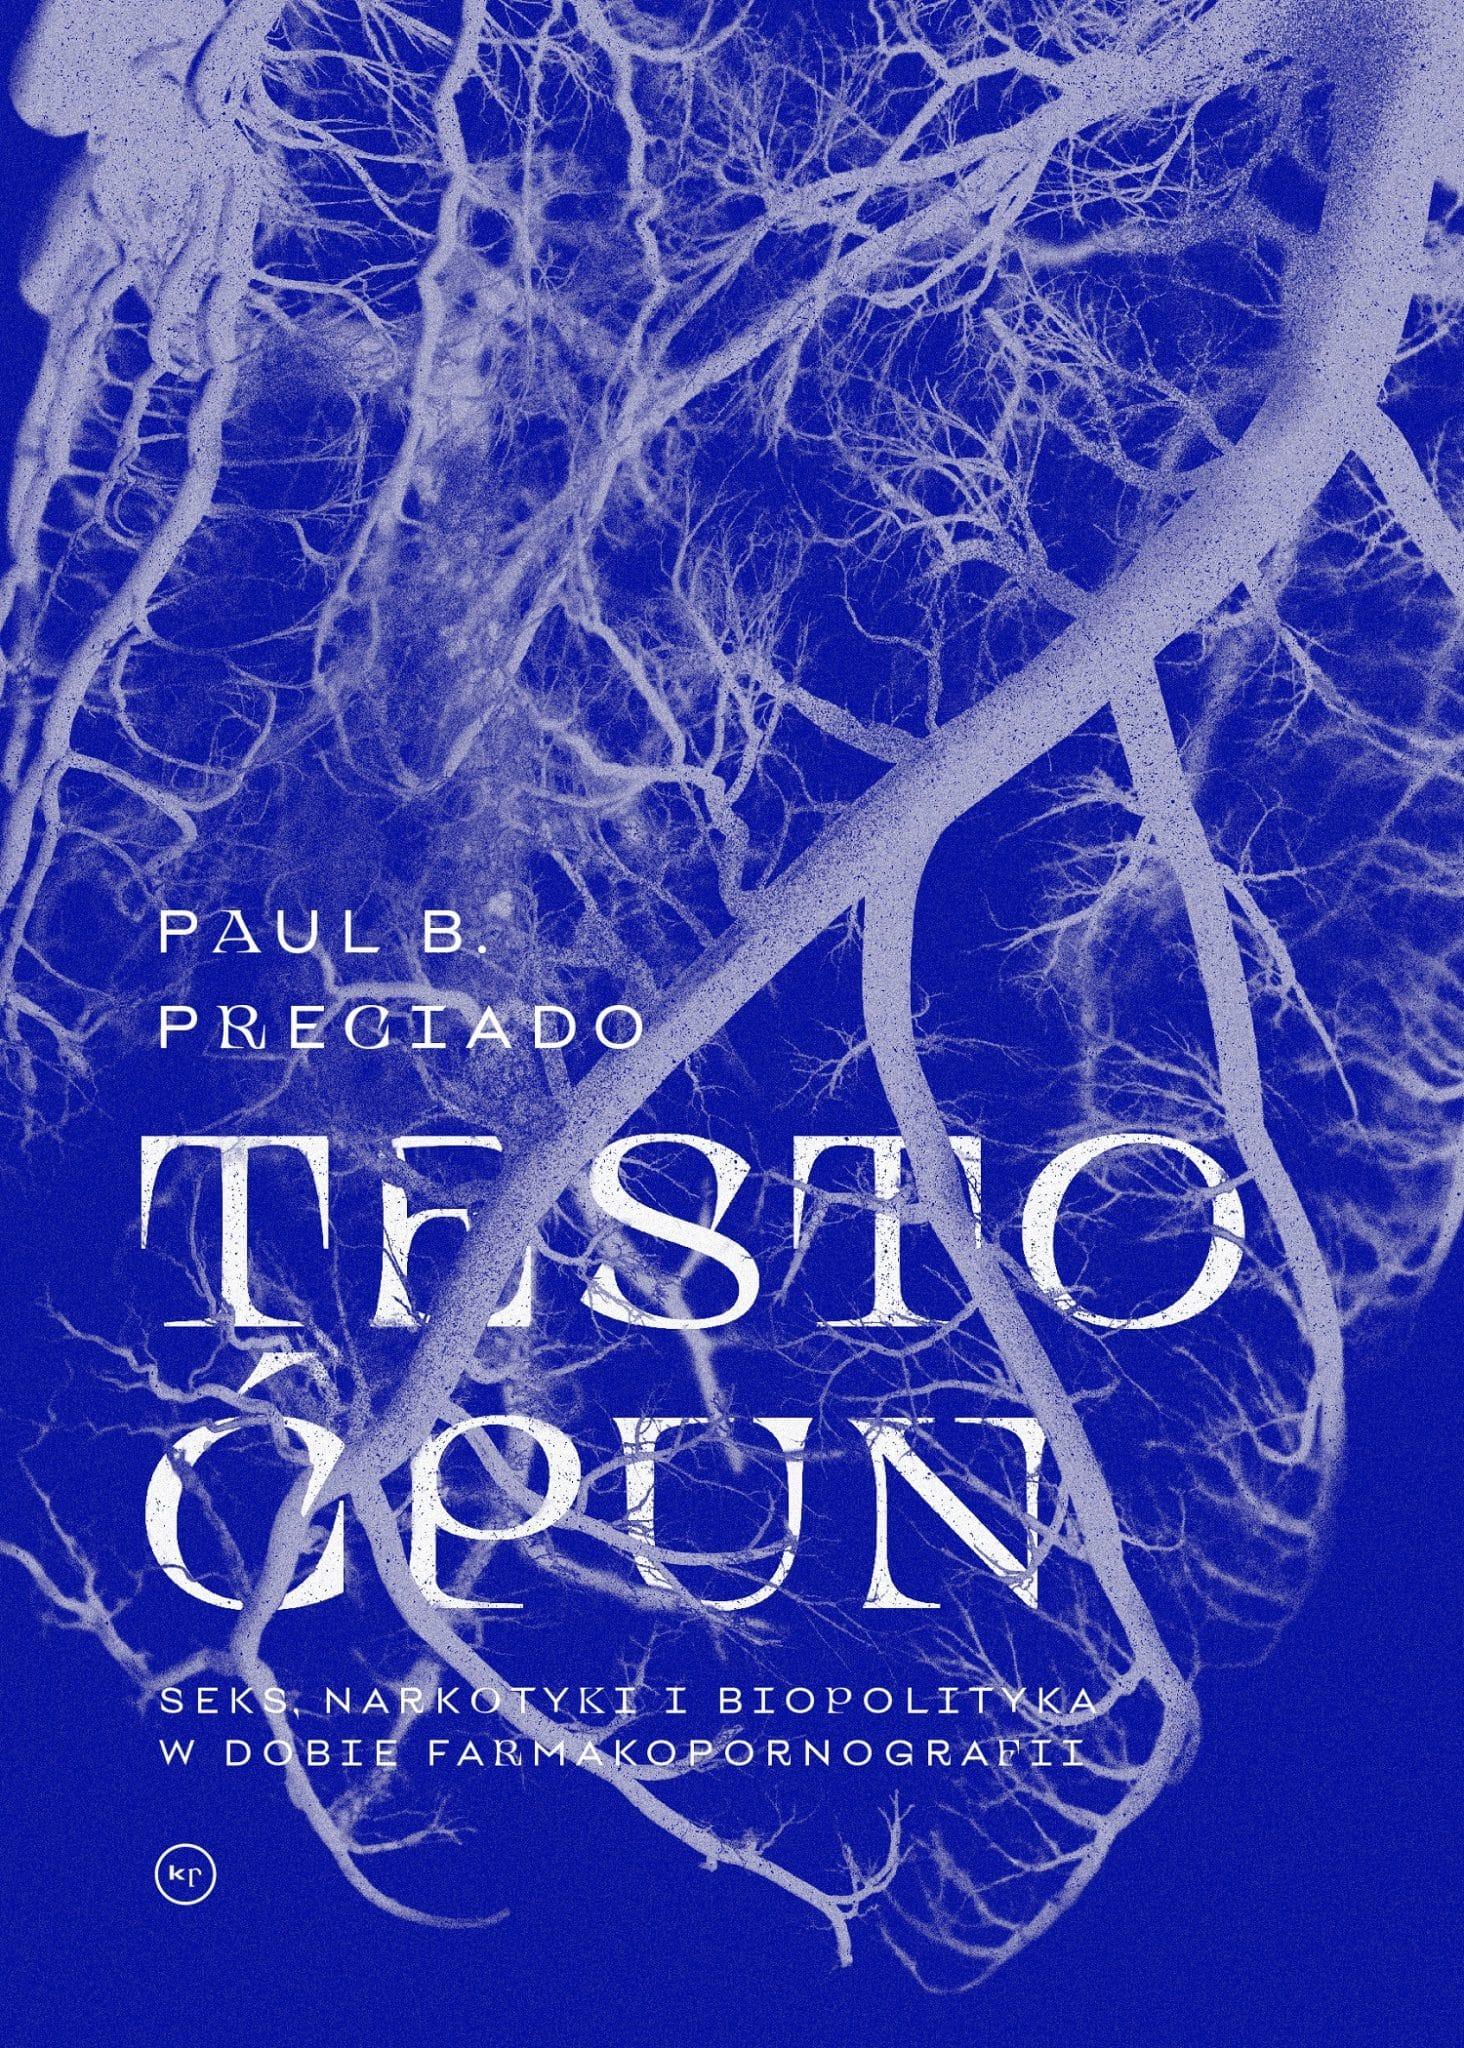 Paul B. Preciado: Testo ćpun